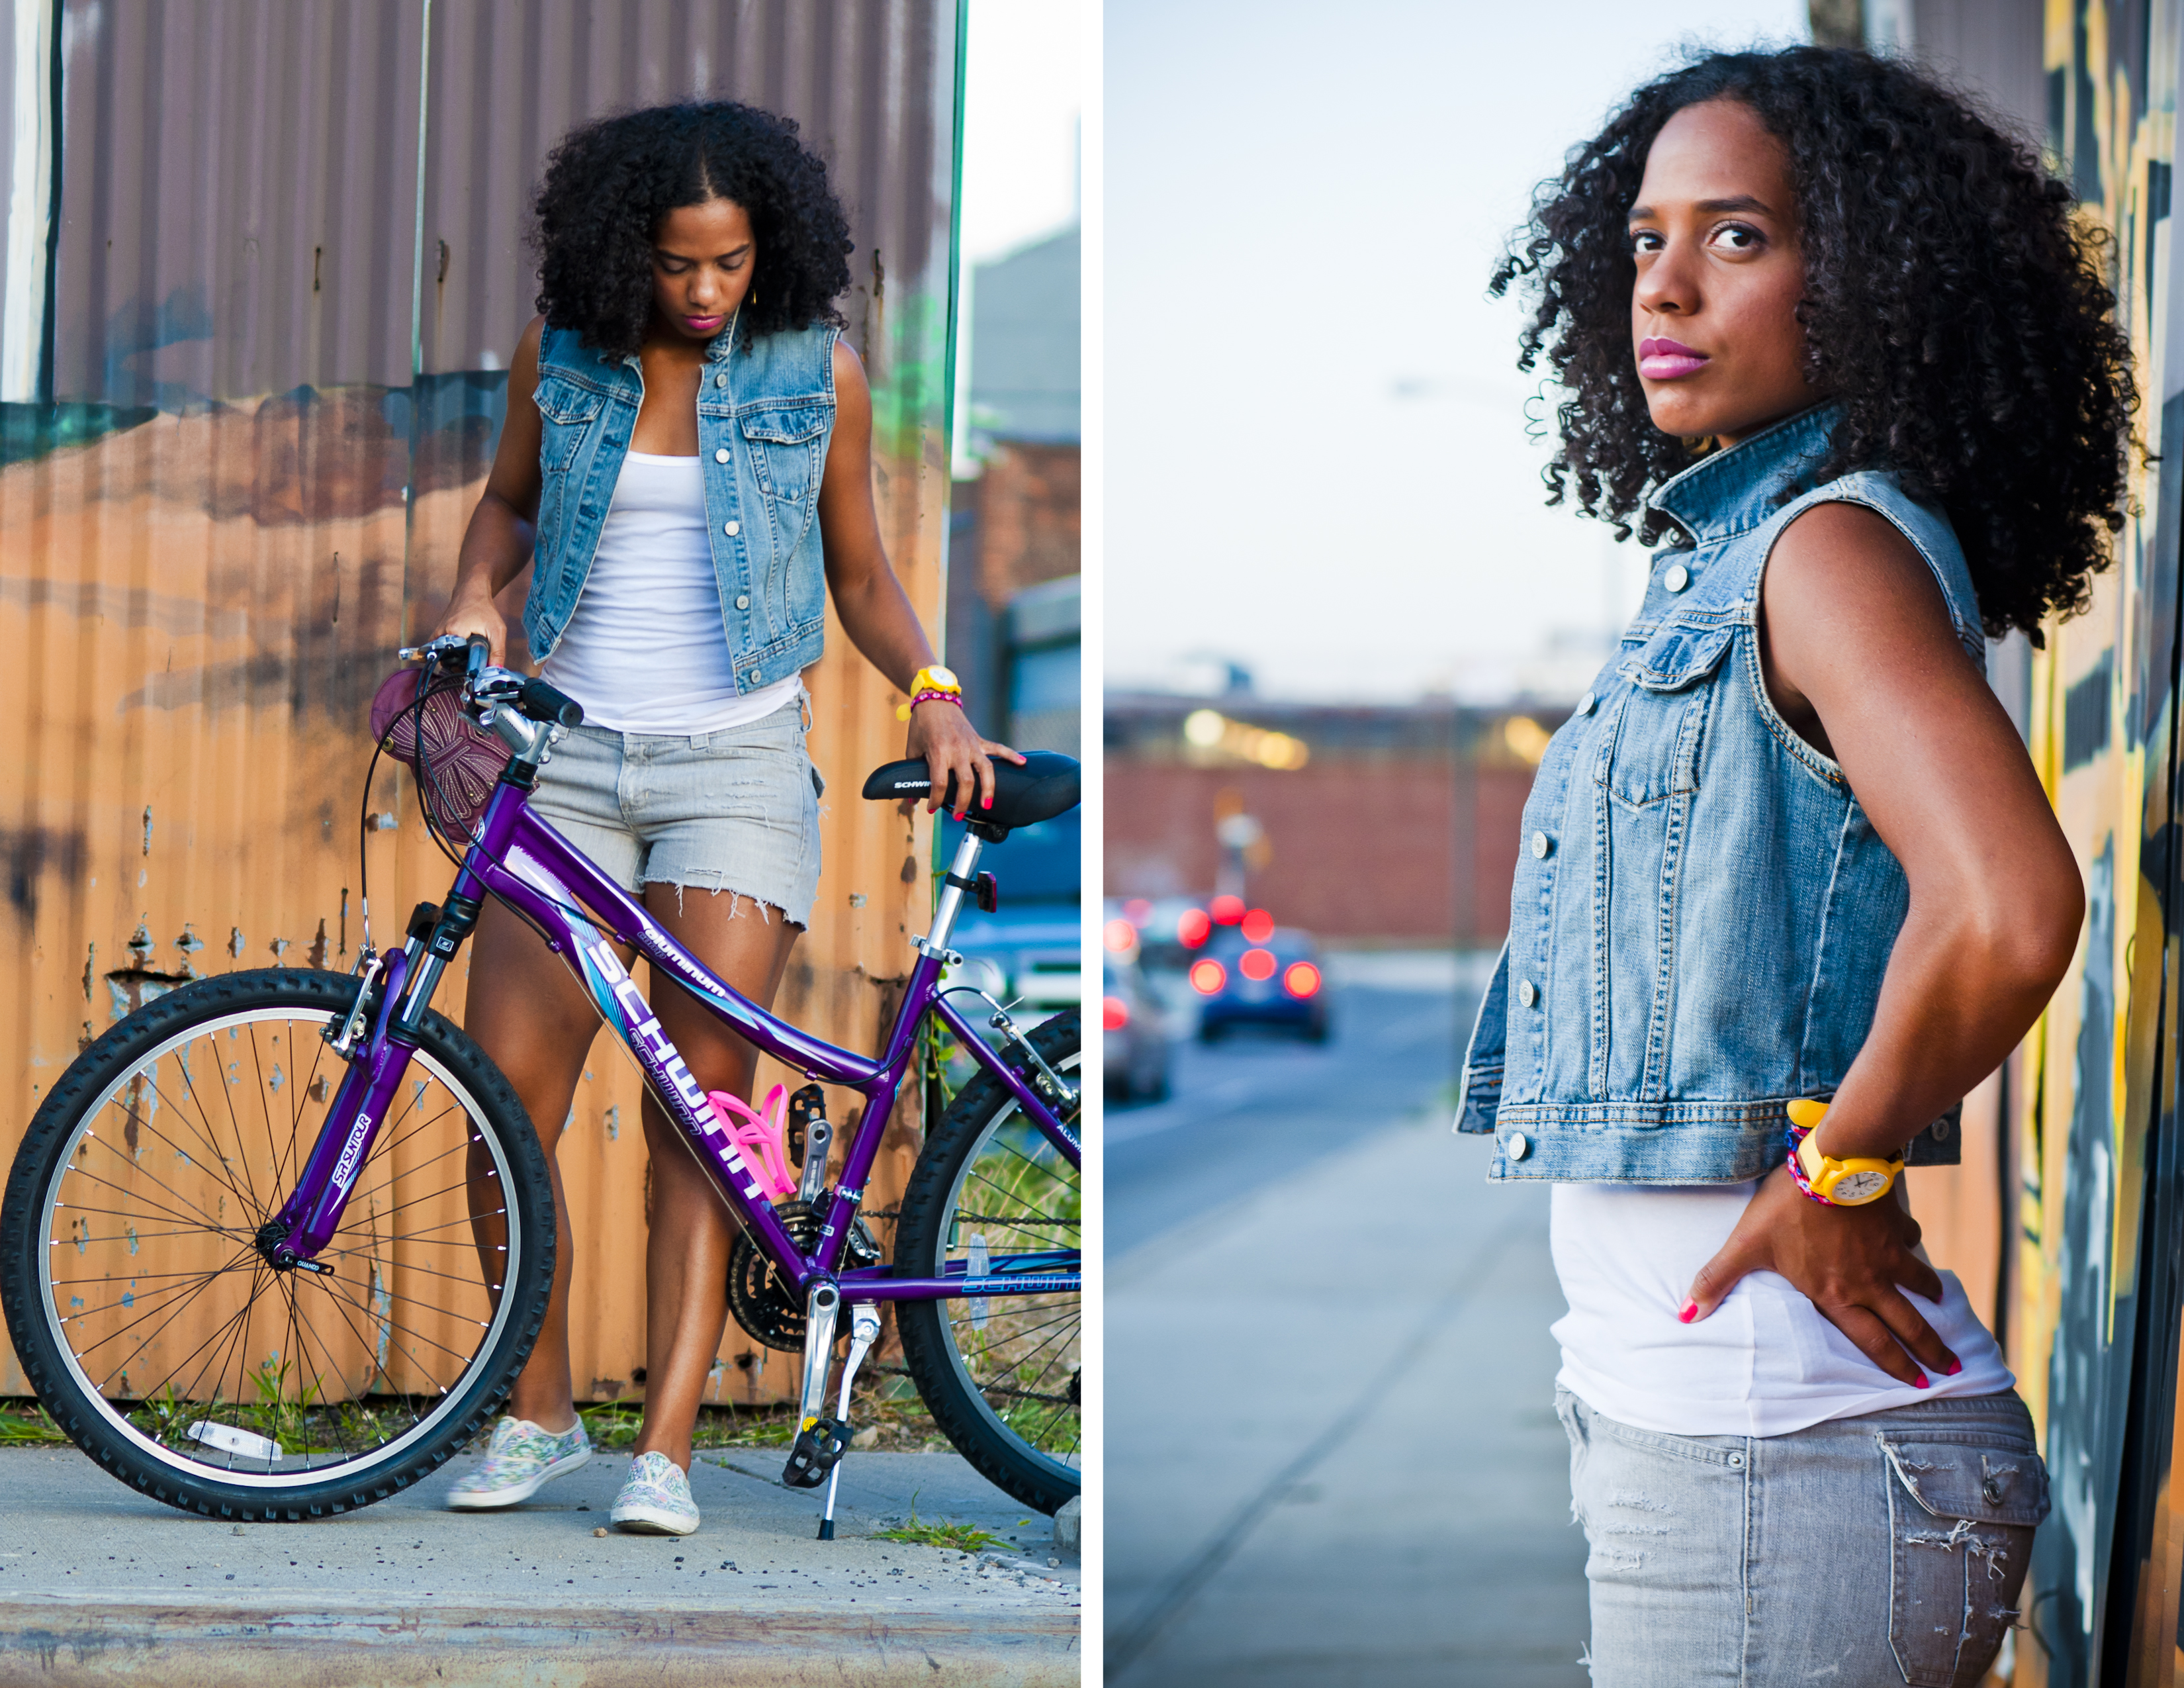 Lorena + Bike Riding